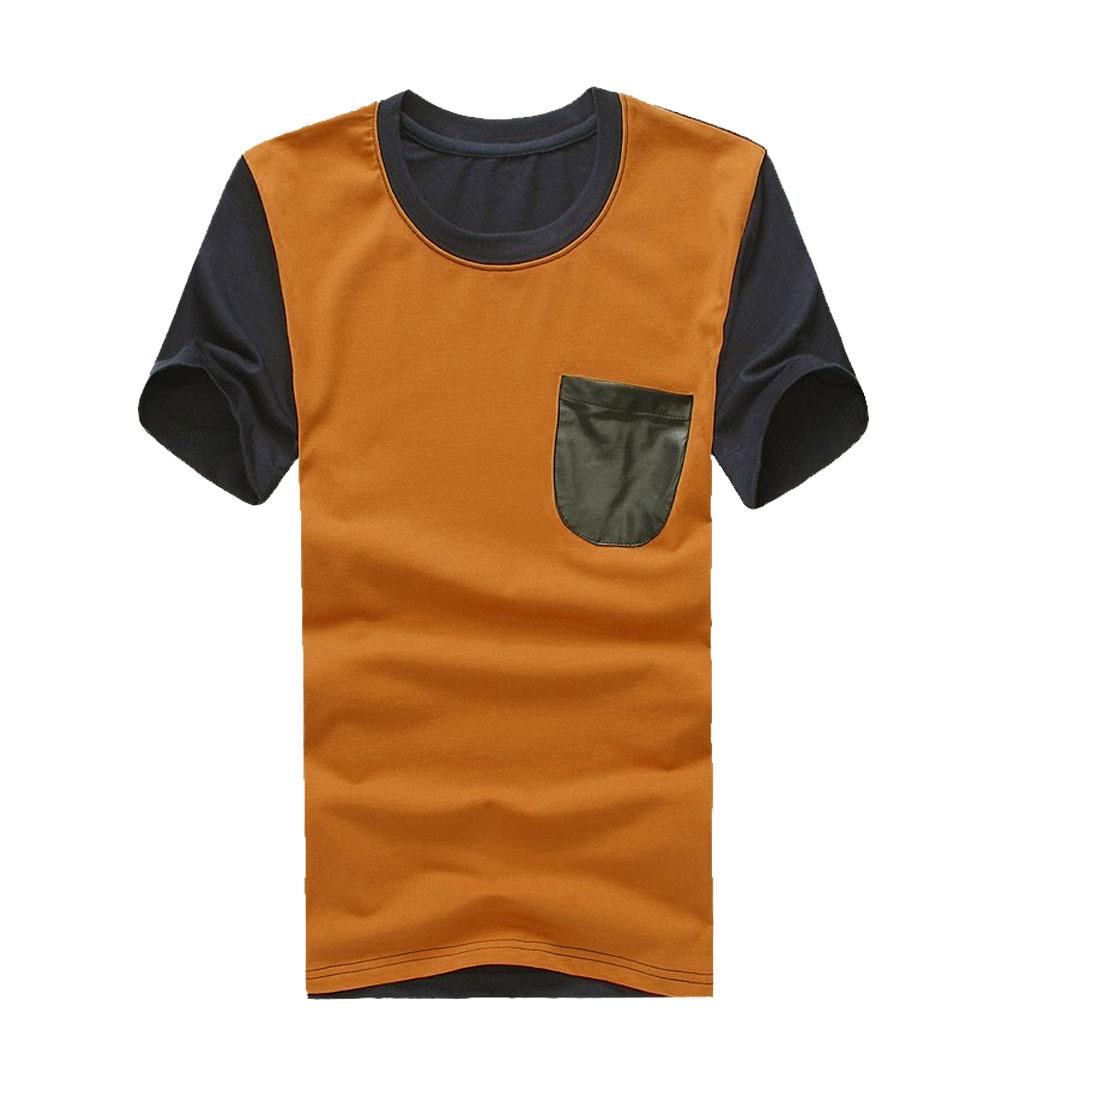 Men Breasted Pocket Stretchy Short-sleeved Chic Shirt Mustard M